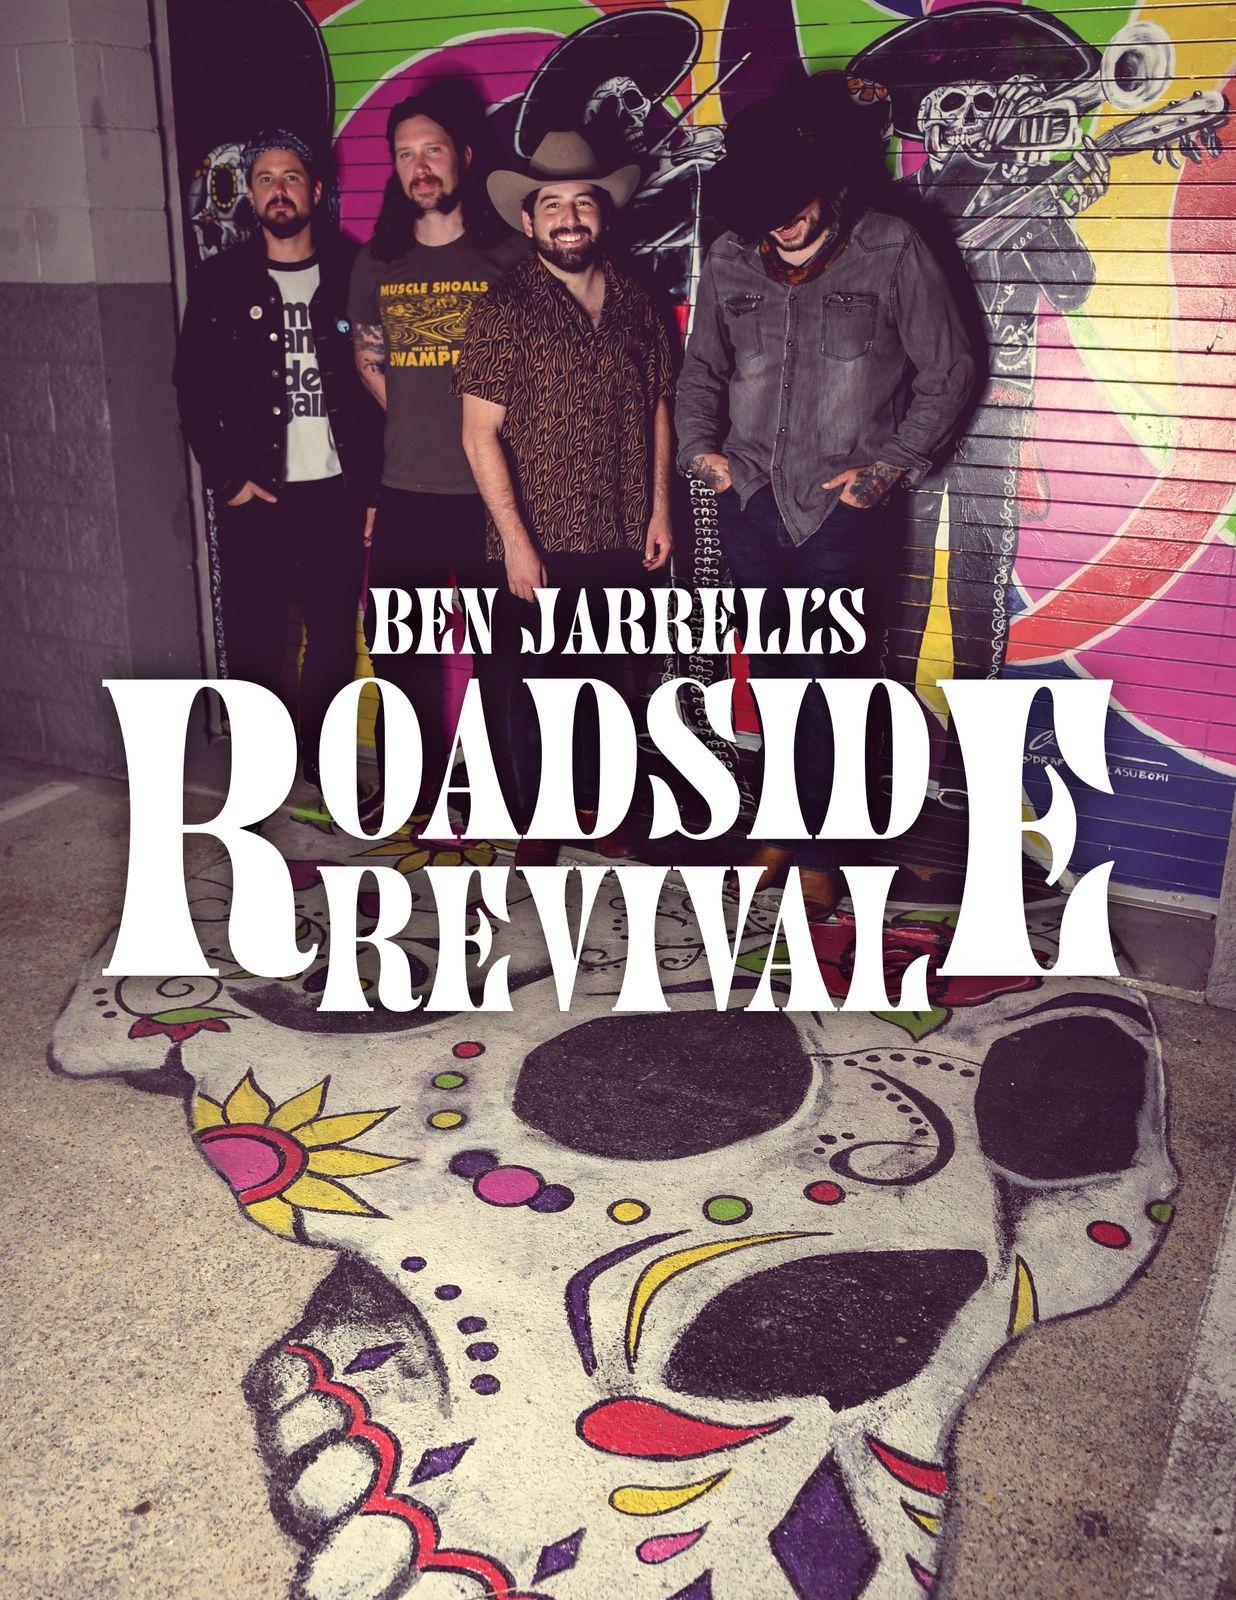 Ben Jarrell's Roadside Revival